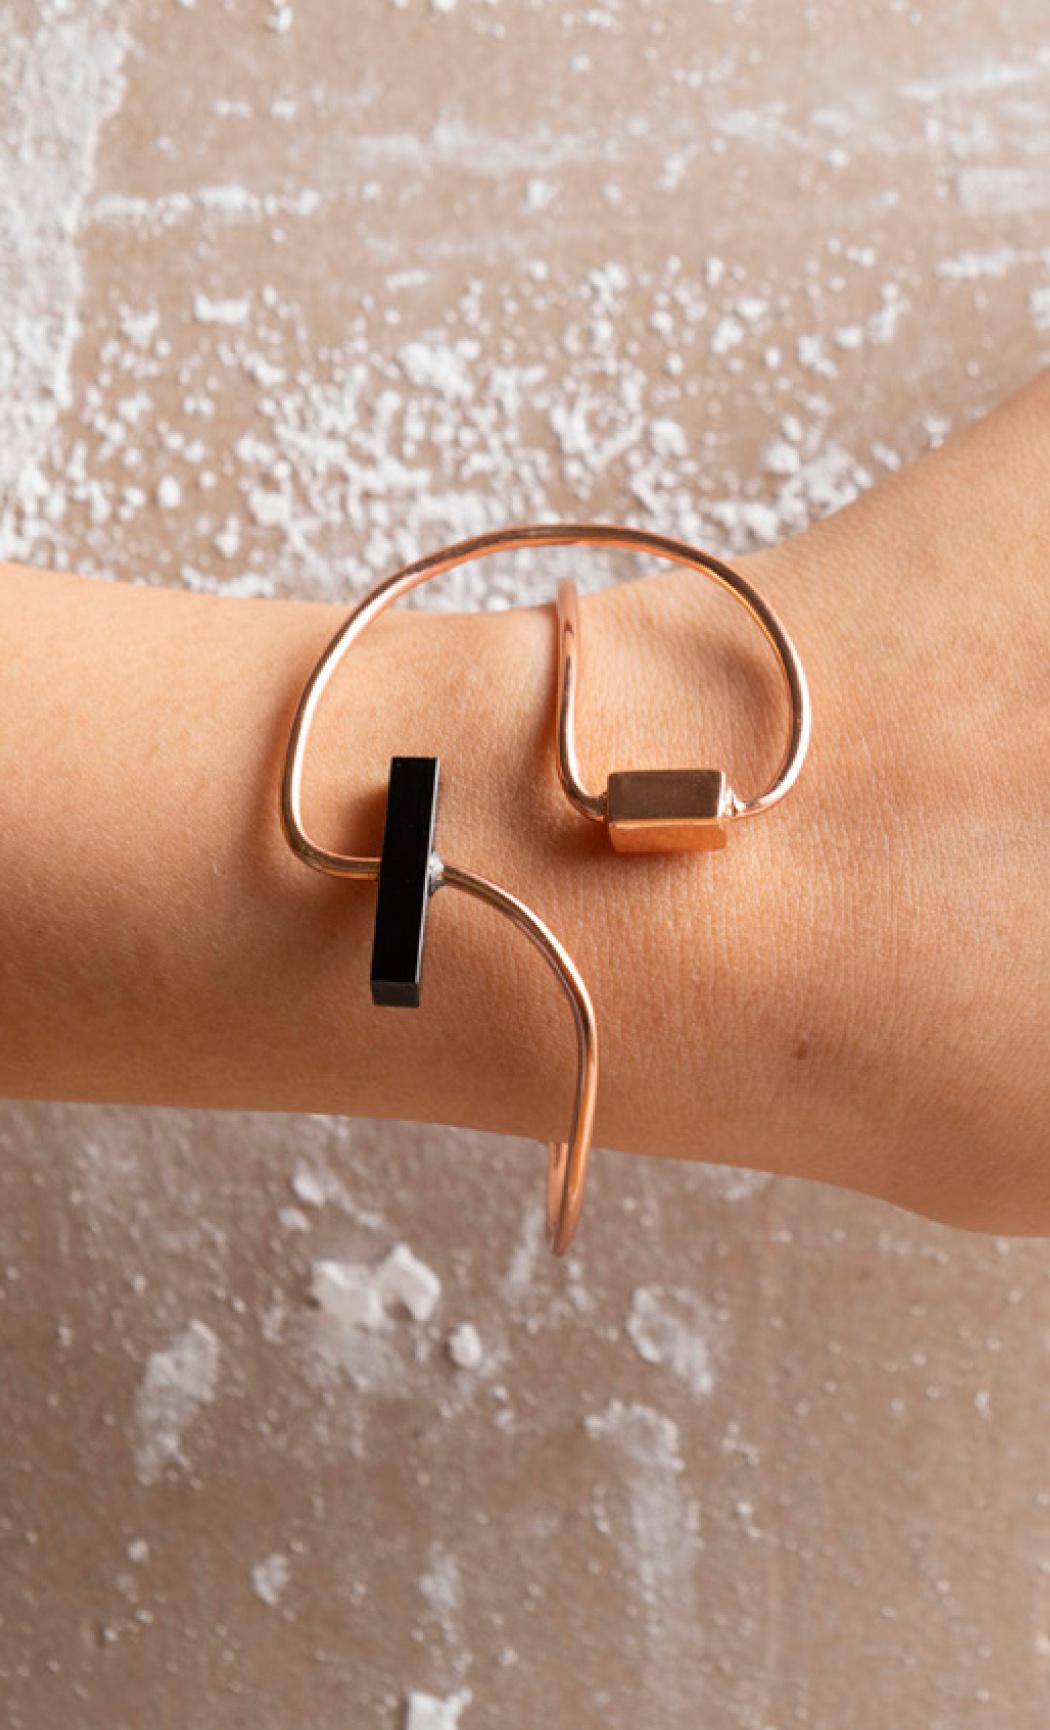 Black Onyx Abstract Brick Cuff Bracelet - Buy Now.